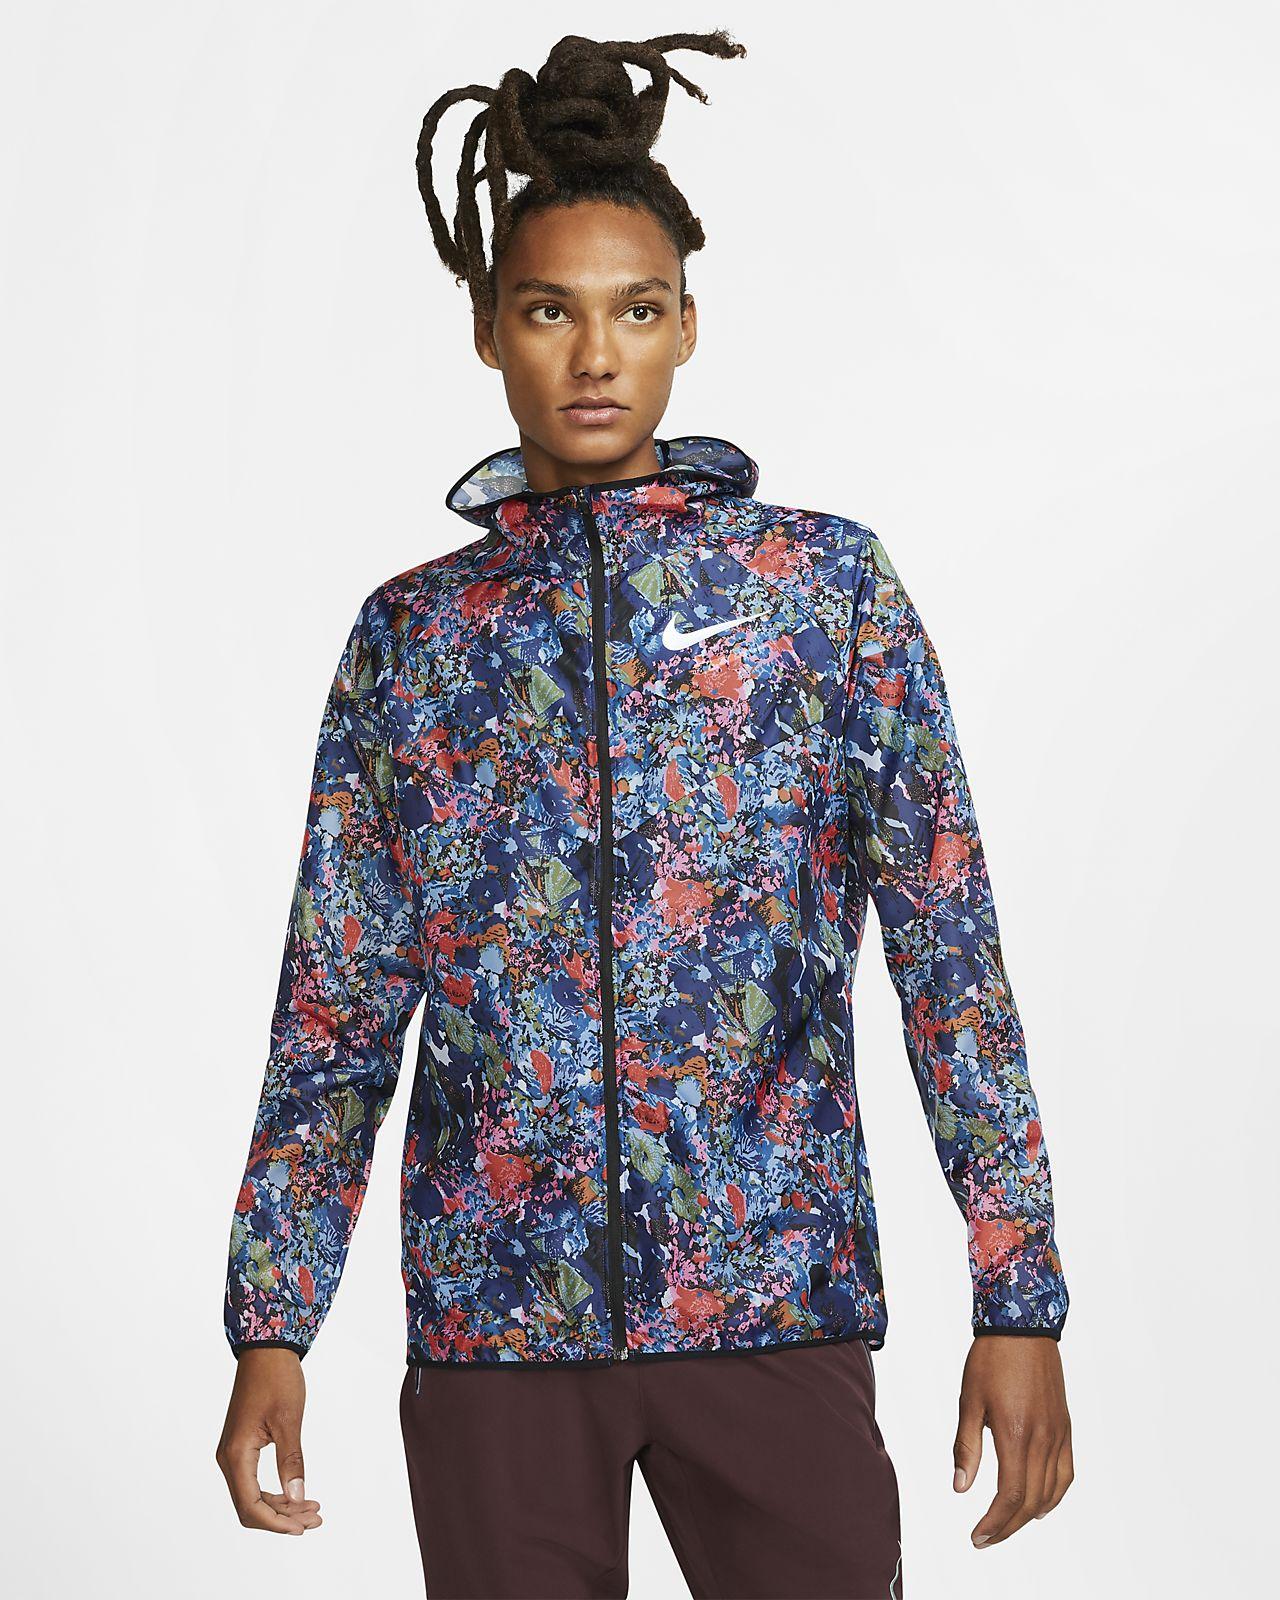 Nike Windrunner Laufjacke mit Print für Herren